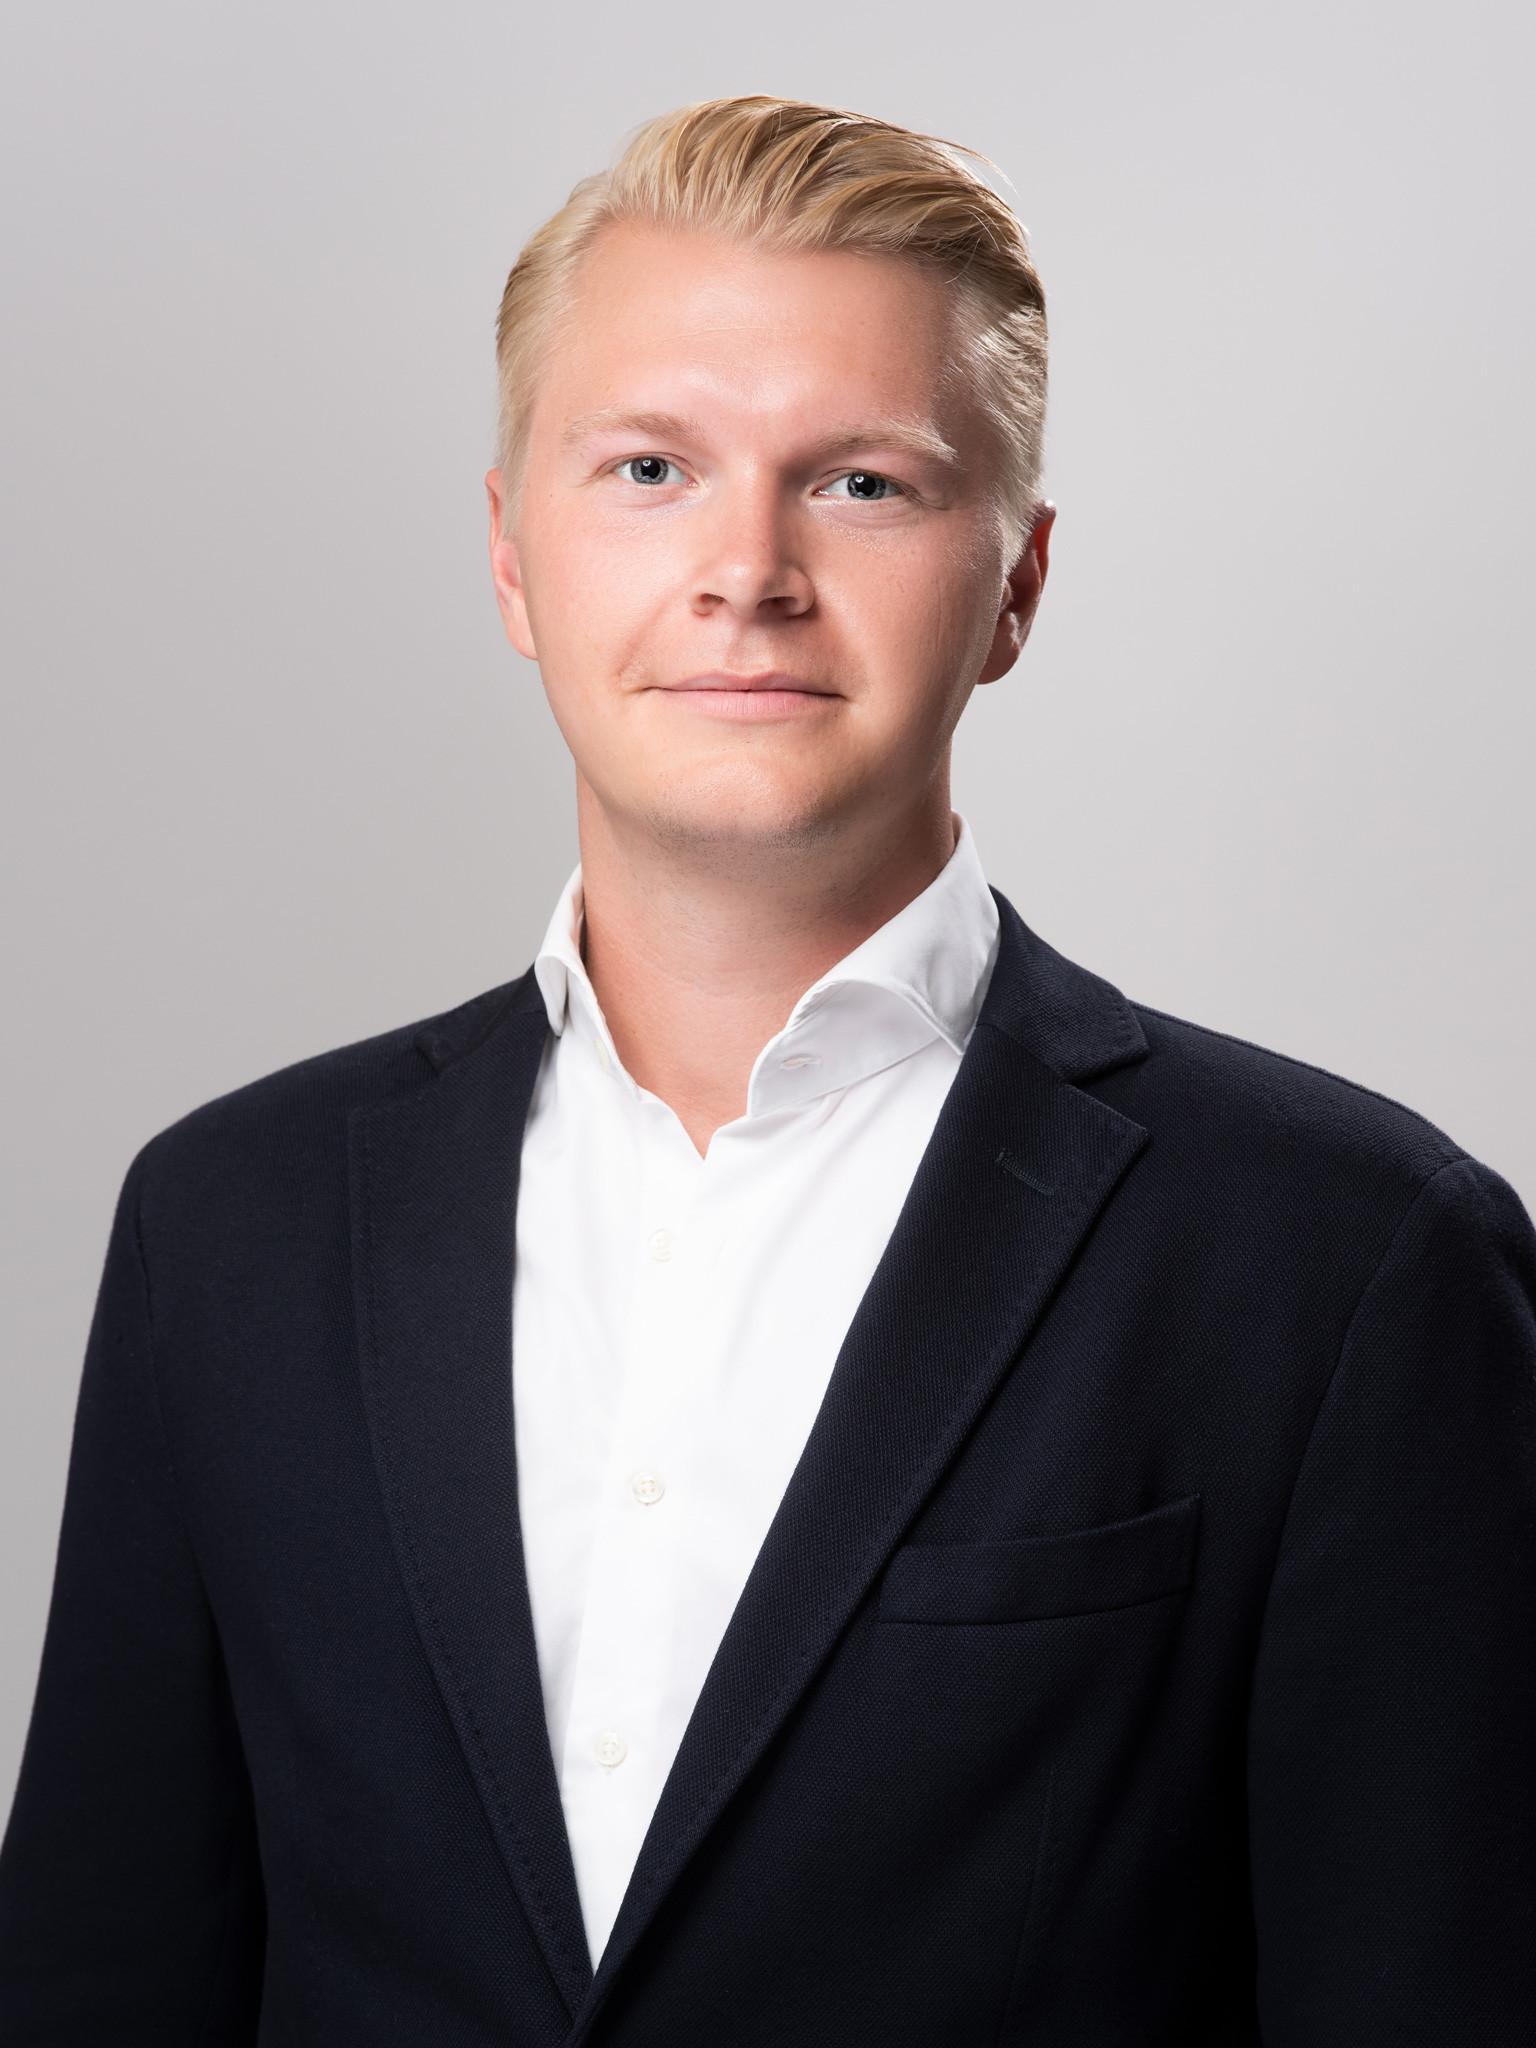 Marcus Christenson